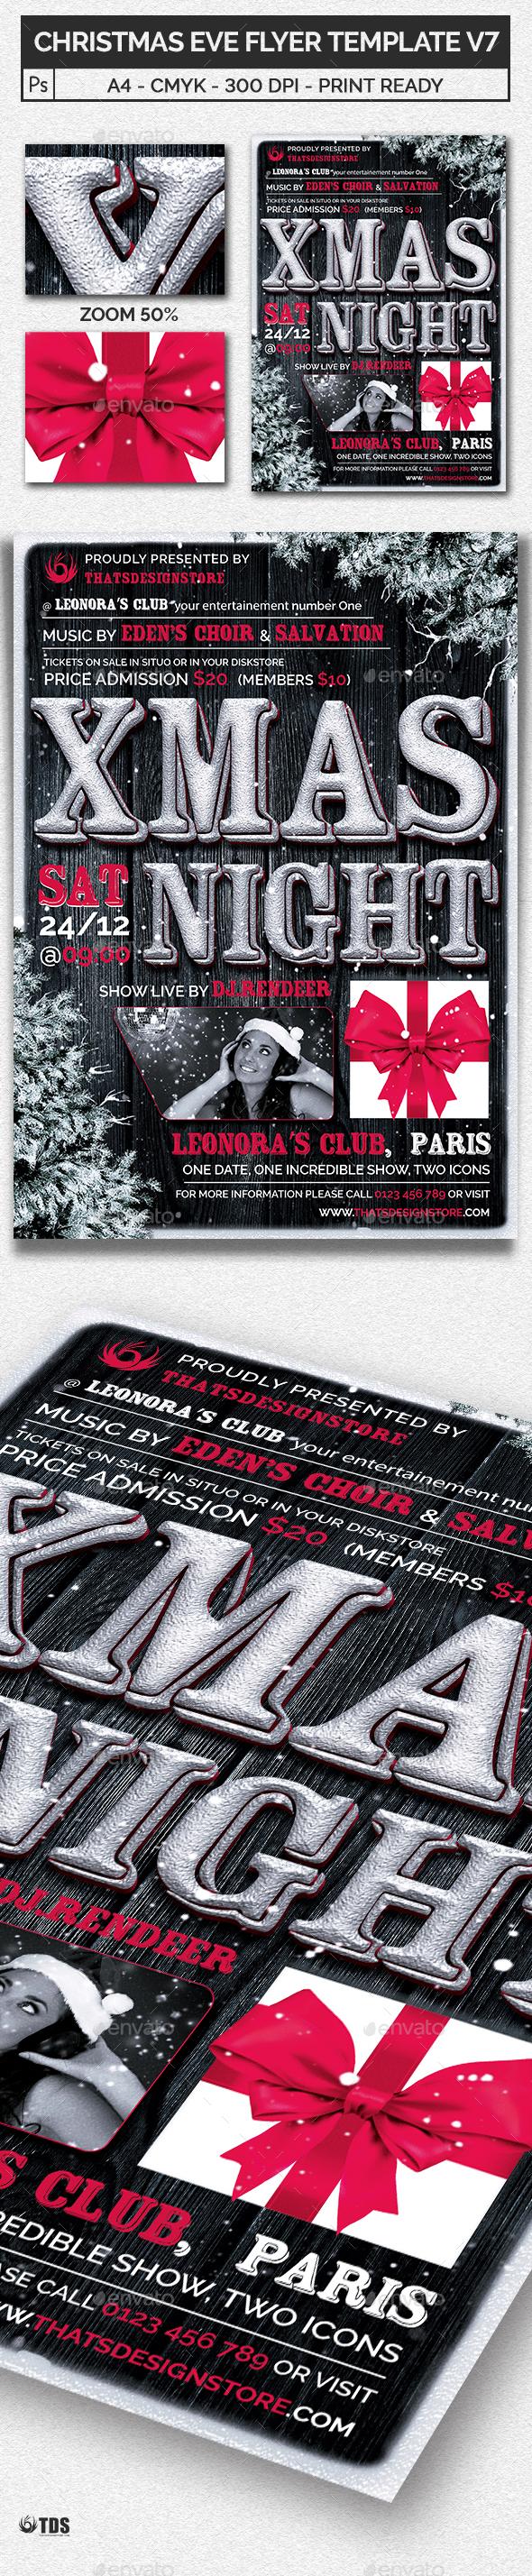 Winter Wonderland Flyer Template Graphics Designs Templates